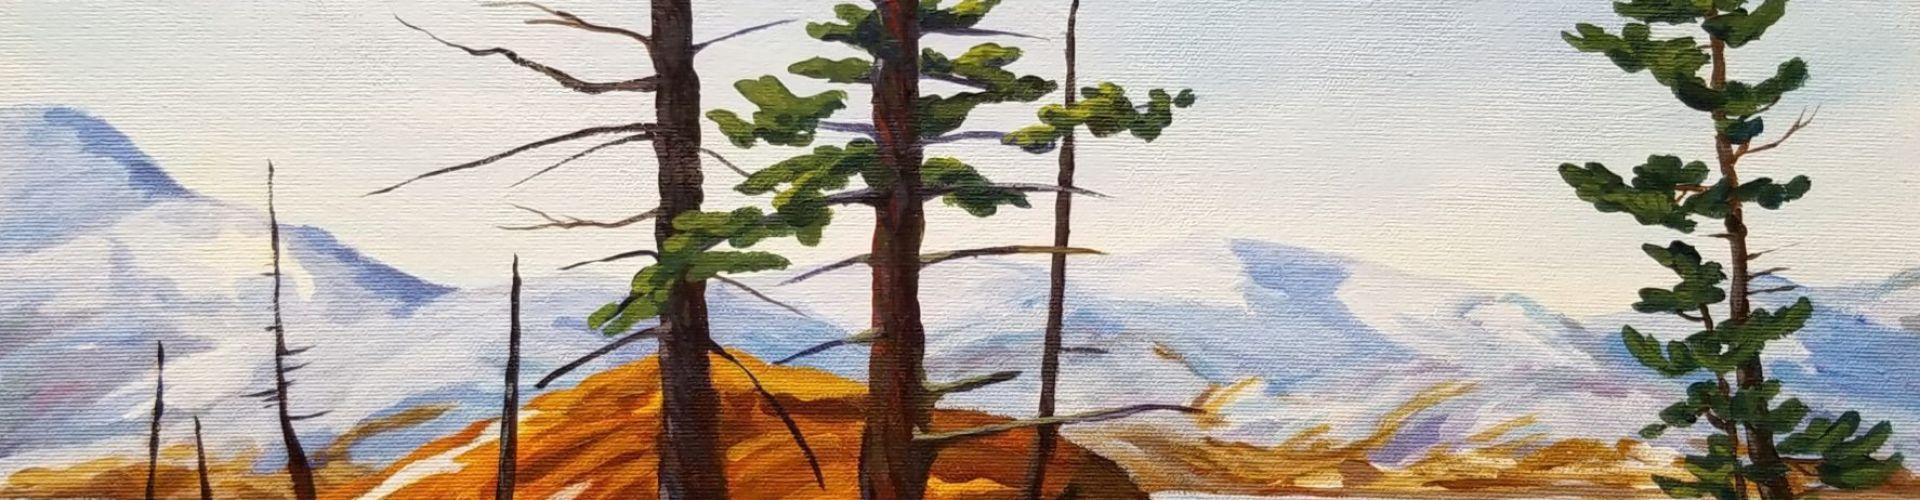 The Survivors painting by Linda Lovisa